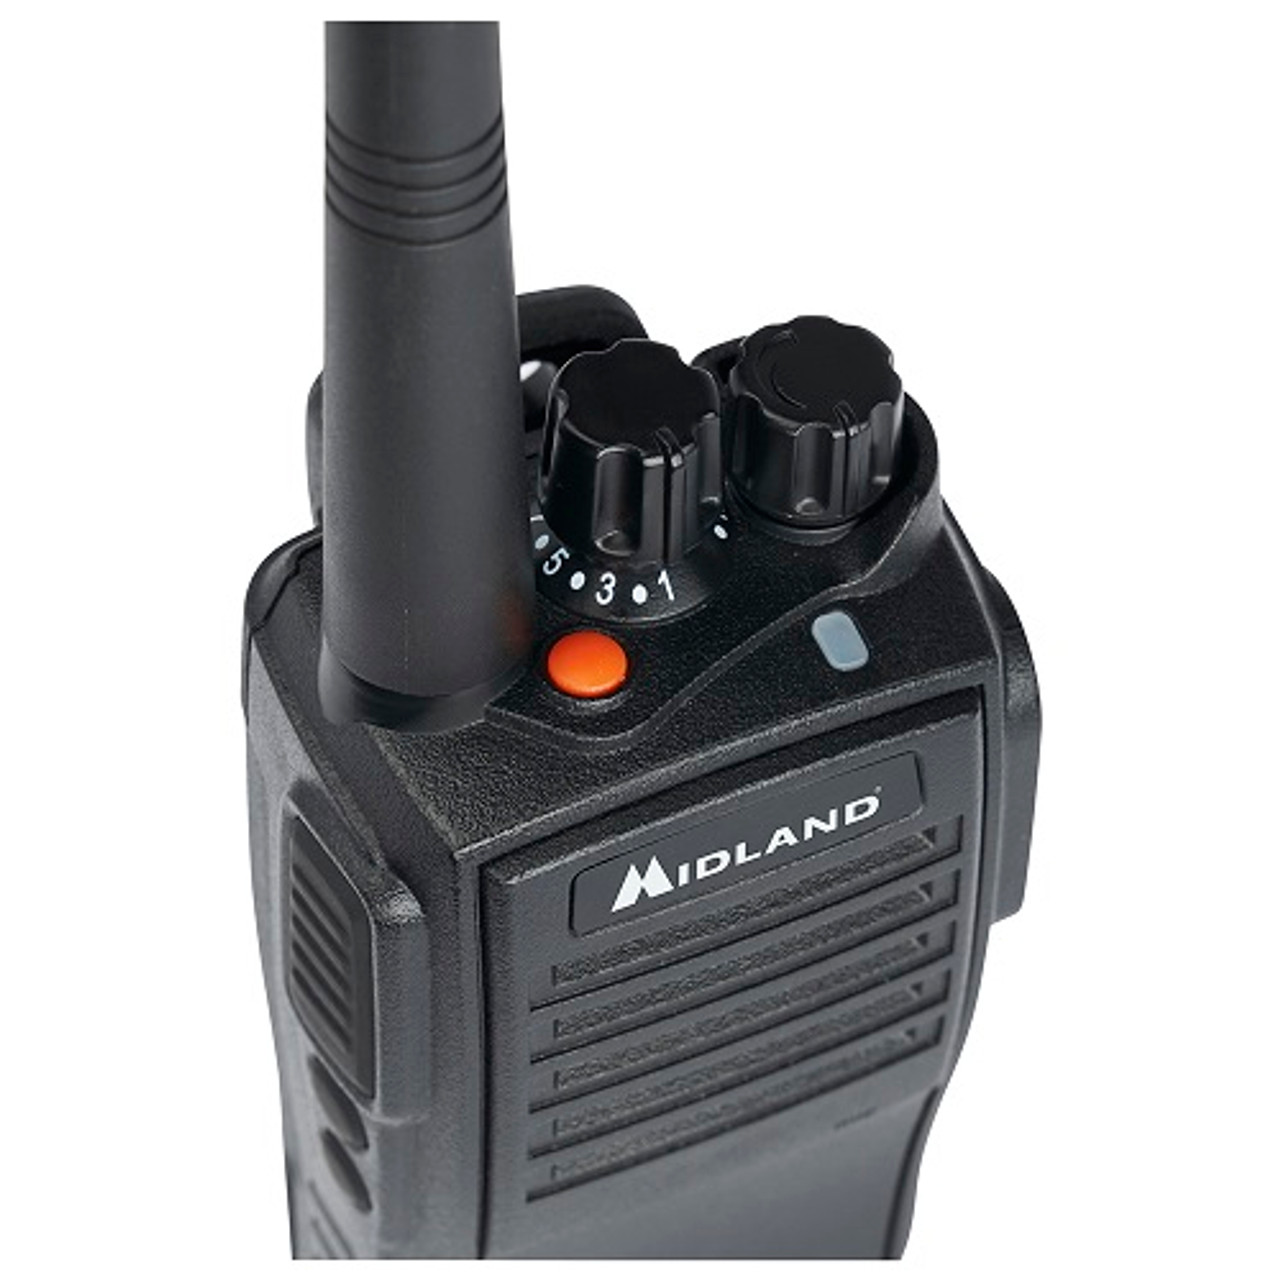 Midland MB400 UHF Two Way Radio with Emergency Button